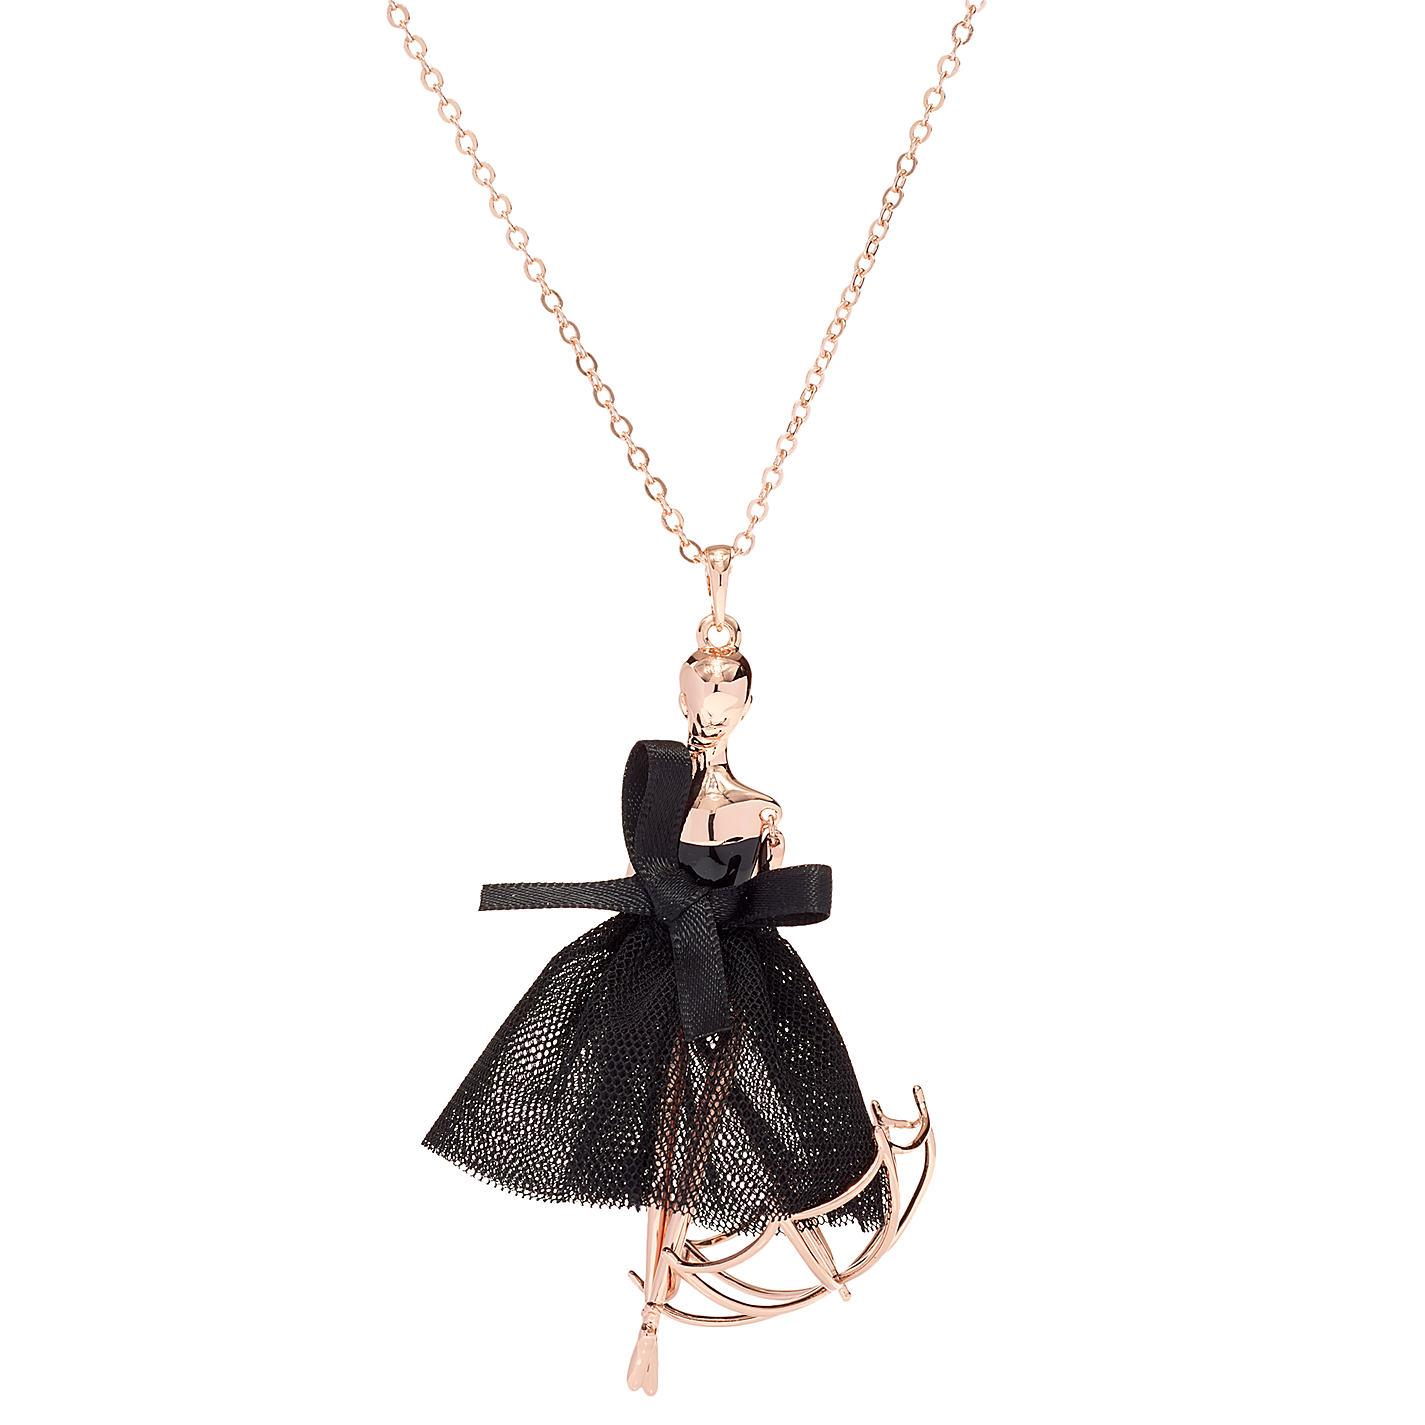 Buy ted baker ursaa umbrella ballerina pendant necklace rose gold buy ted baker ursaa umbrella ballerina pendant necklace rose goldblack online at johnlewis aloadofball Choice Image